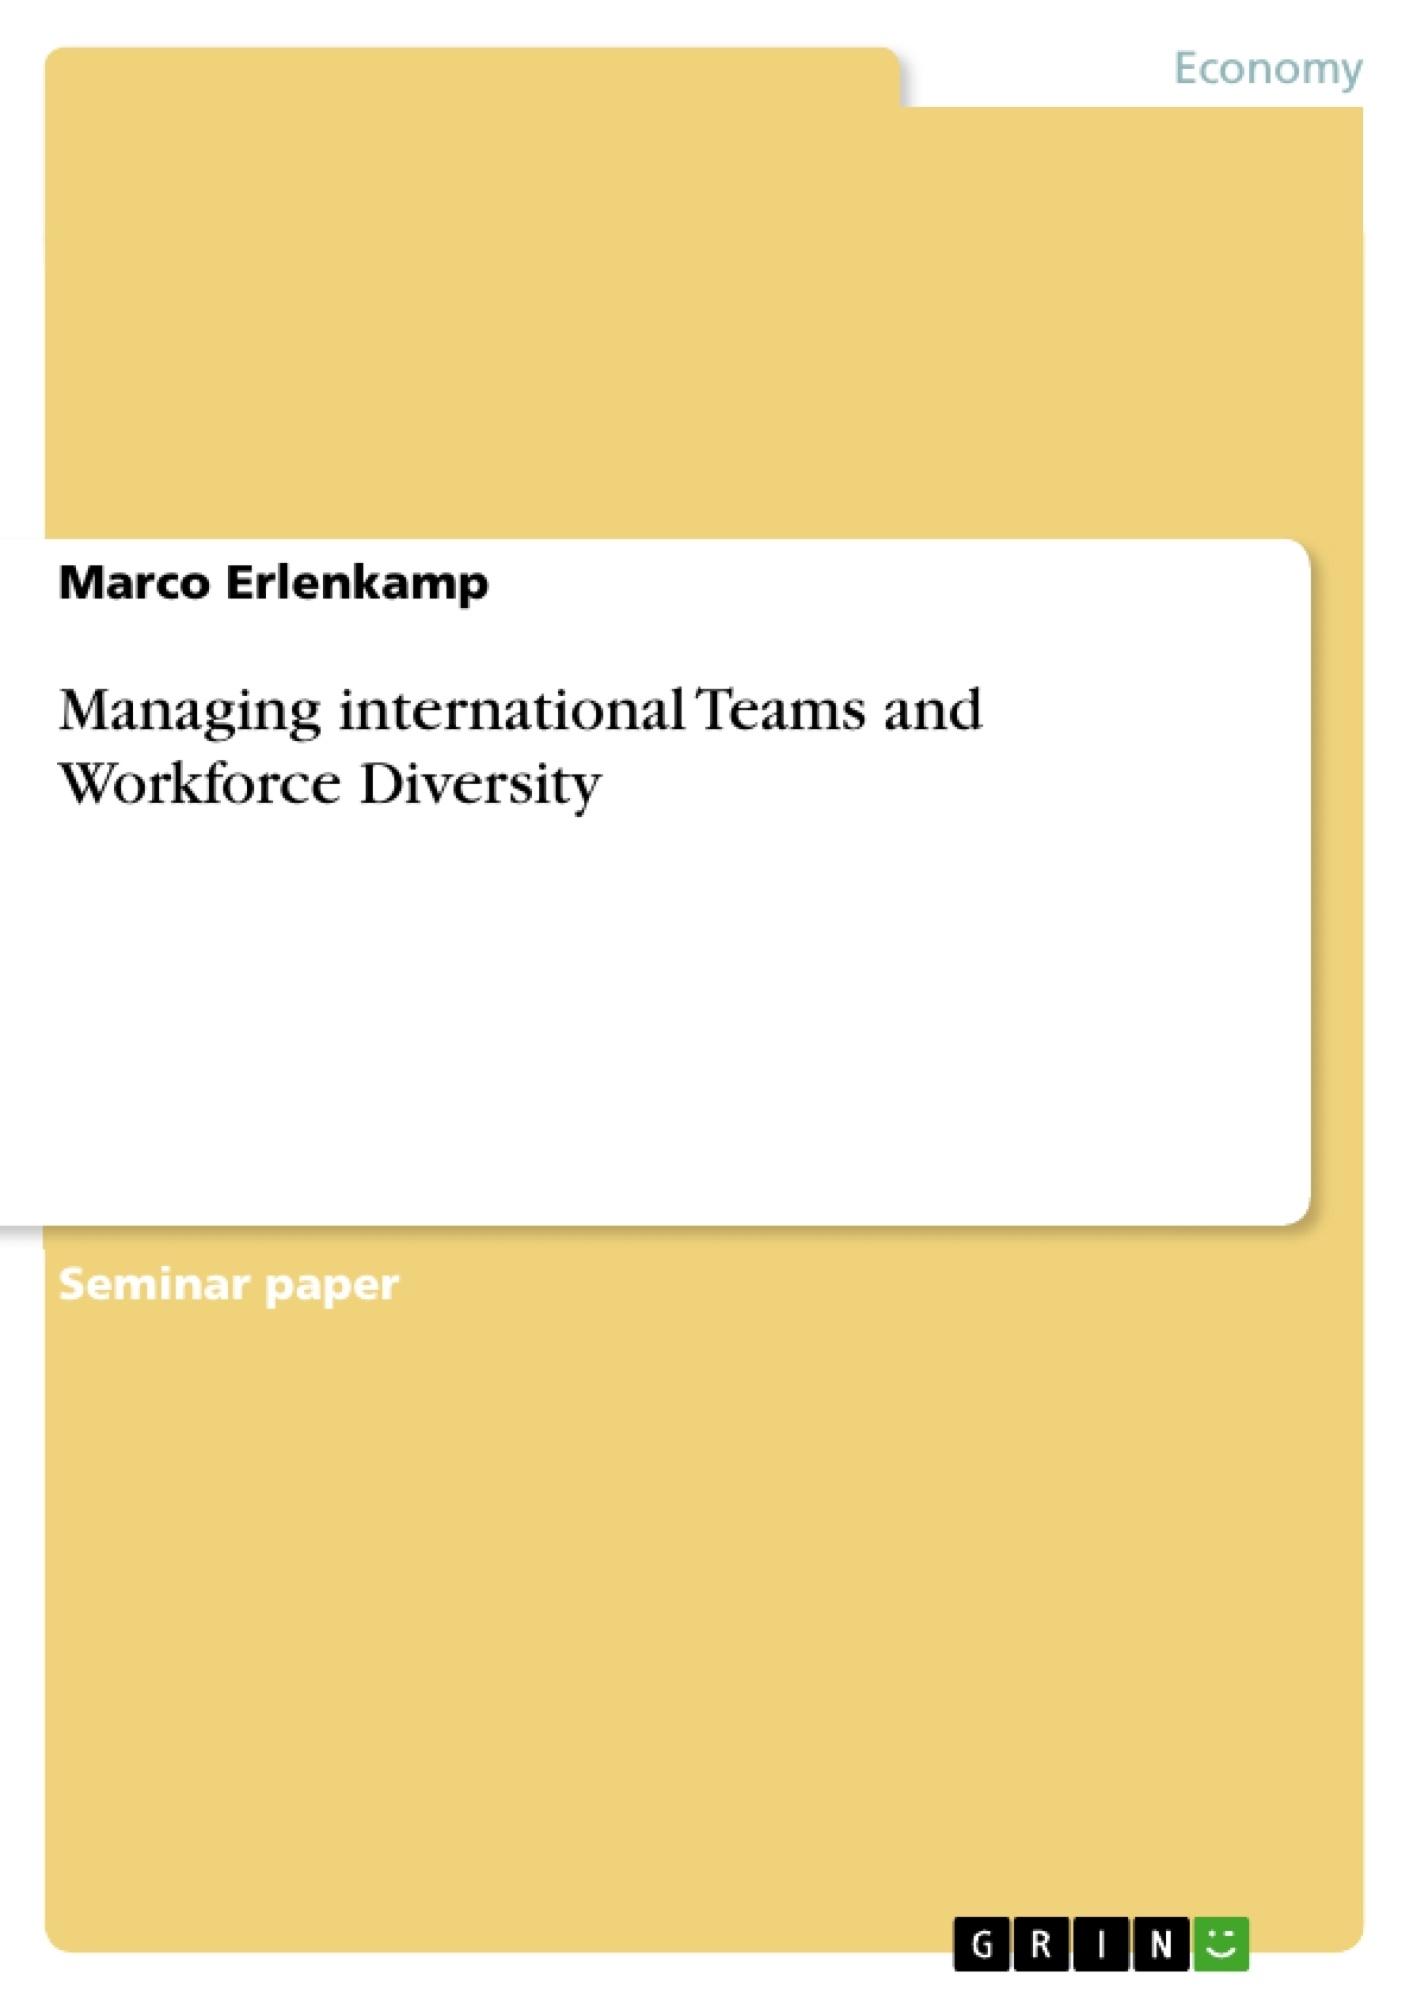 Title: Managing international Teams and Workforce Diversity